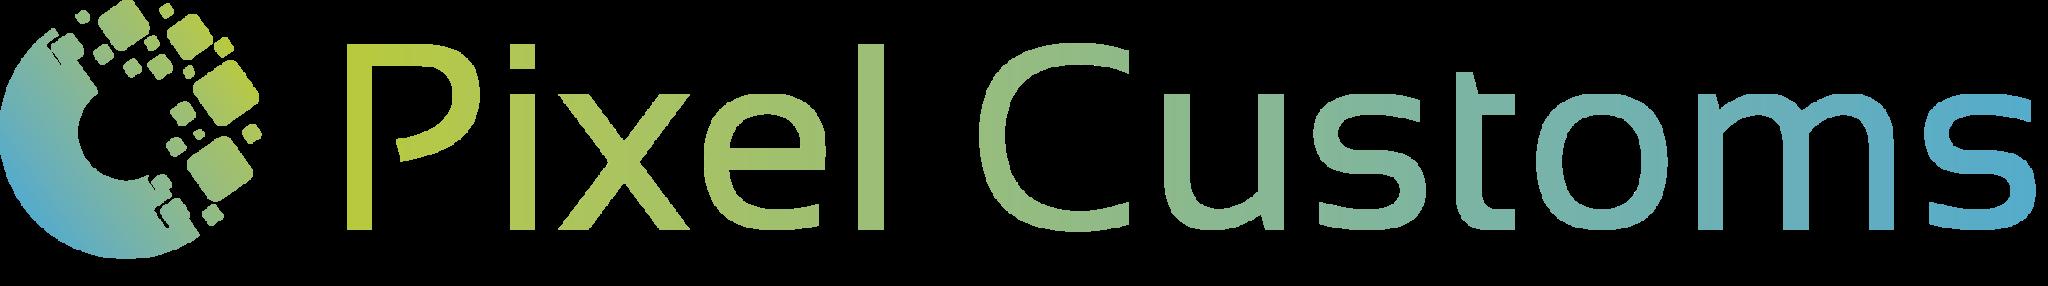 logo 2 - Web & Mobile Development